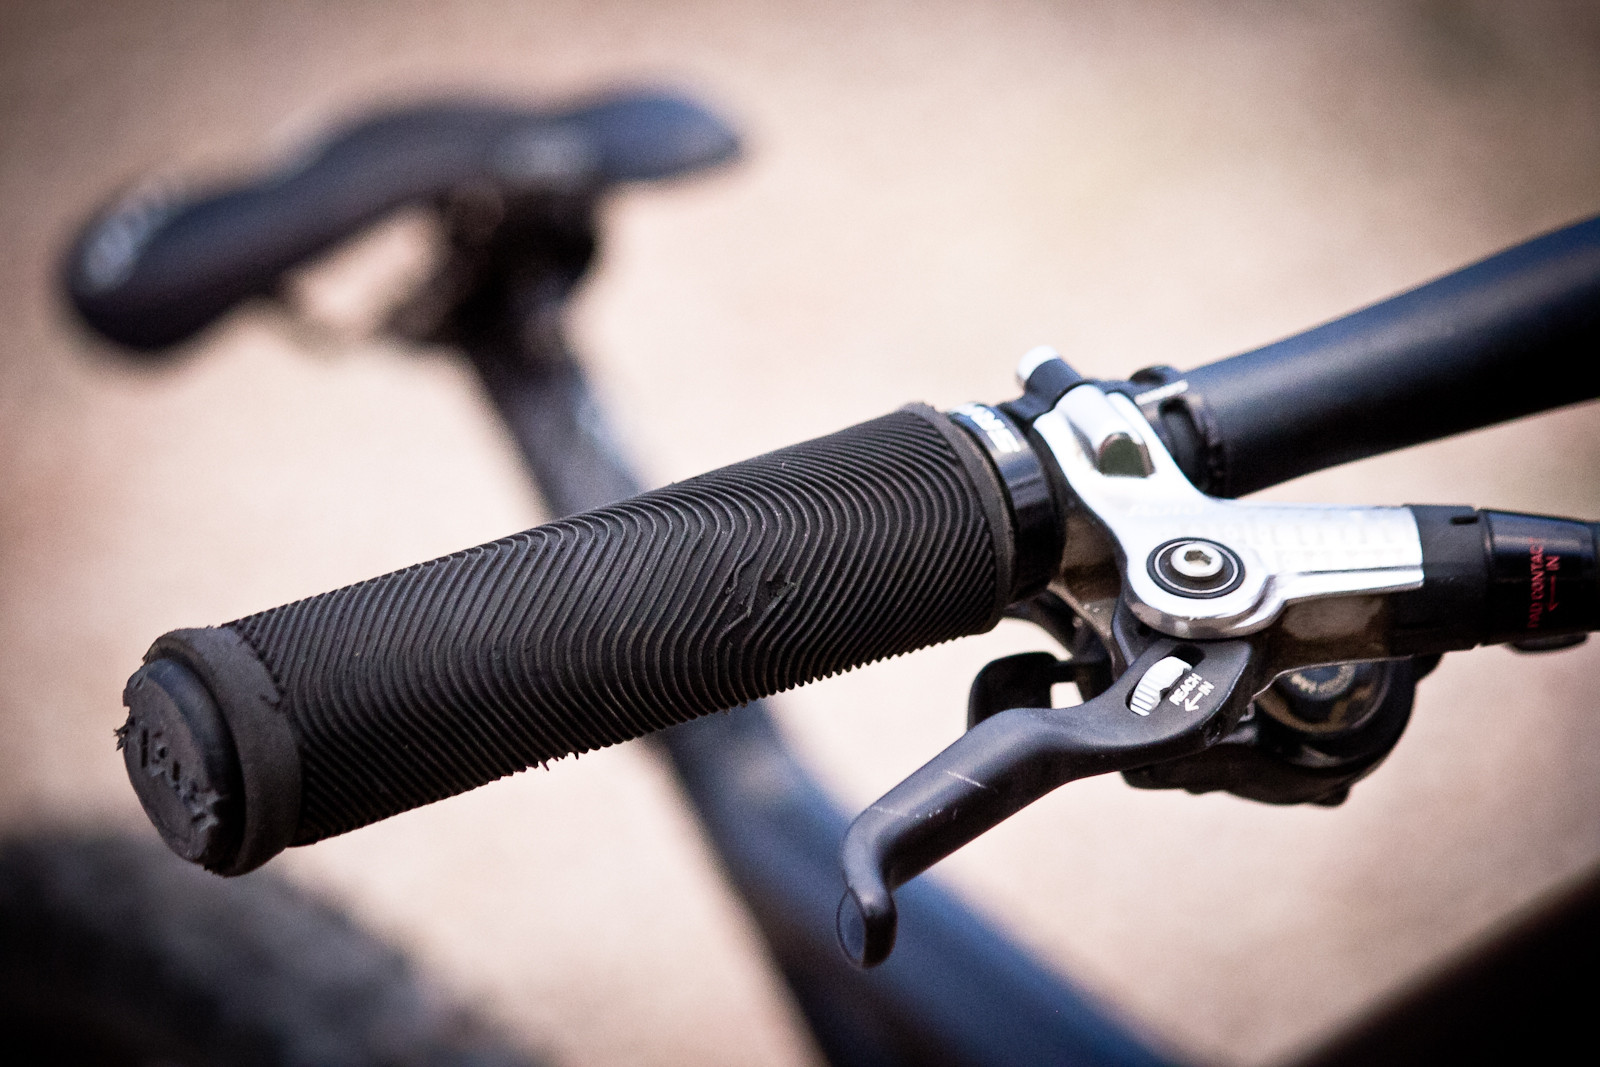 Kyle Strait's Sensus Swayze Grips with Custom Sleeve  - Rampage Pro Bike: Kyle Strait's GT Fury - Mountain Biking Pictures - Vital MTB